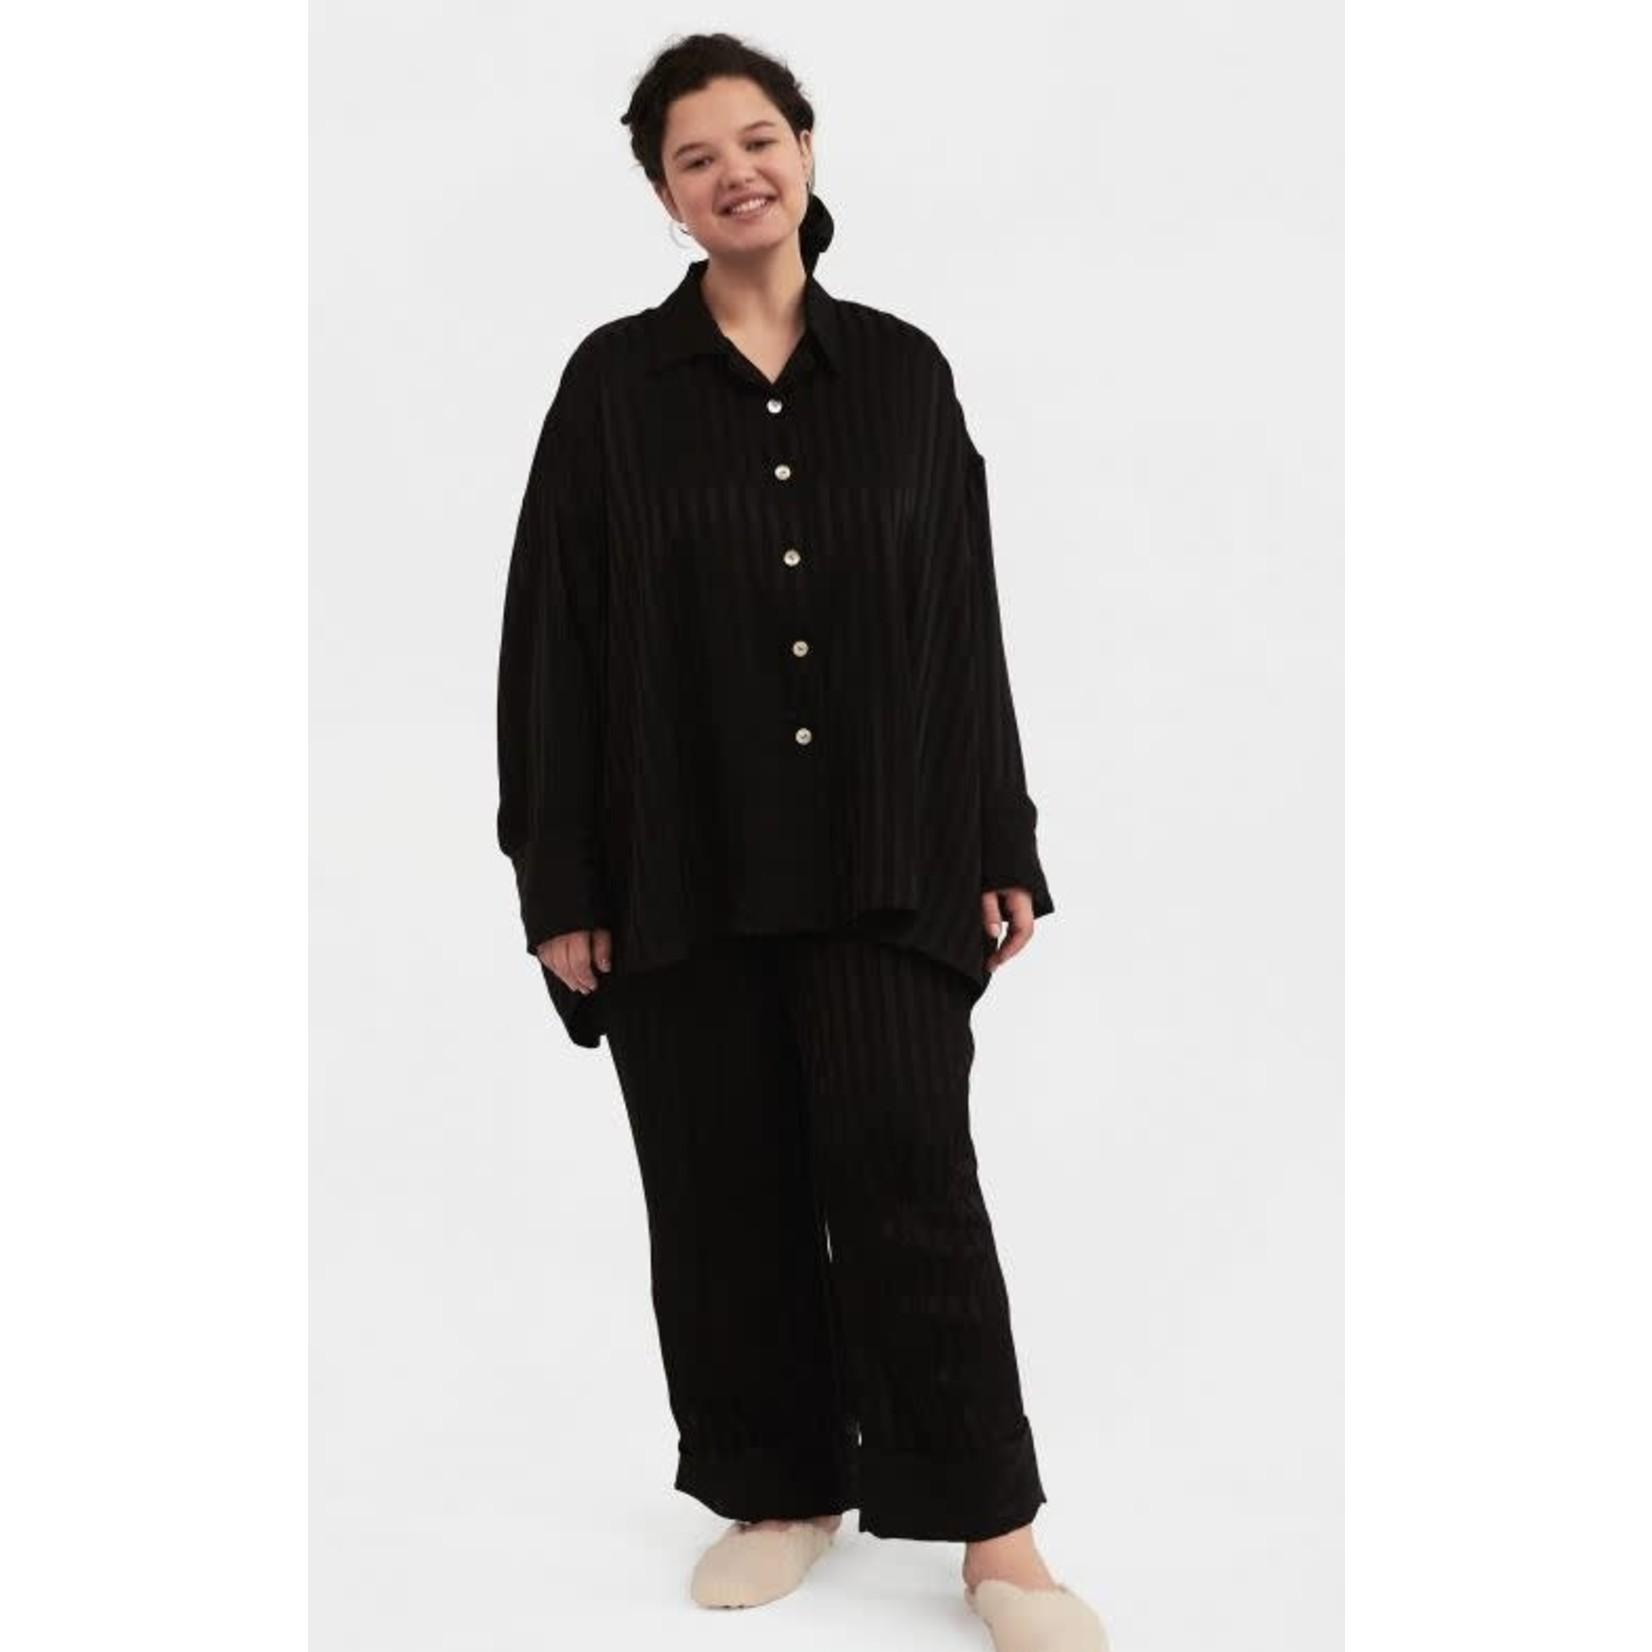 The Sleeper Viscose Pajama Set in Black